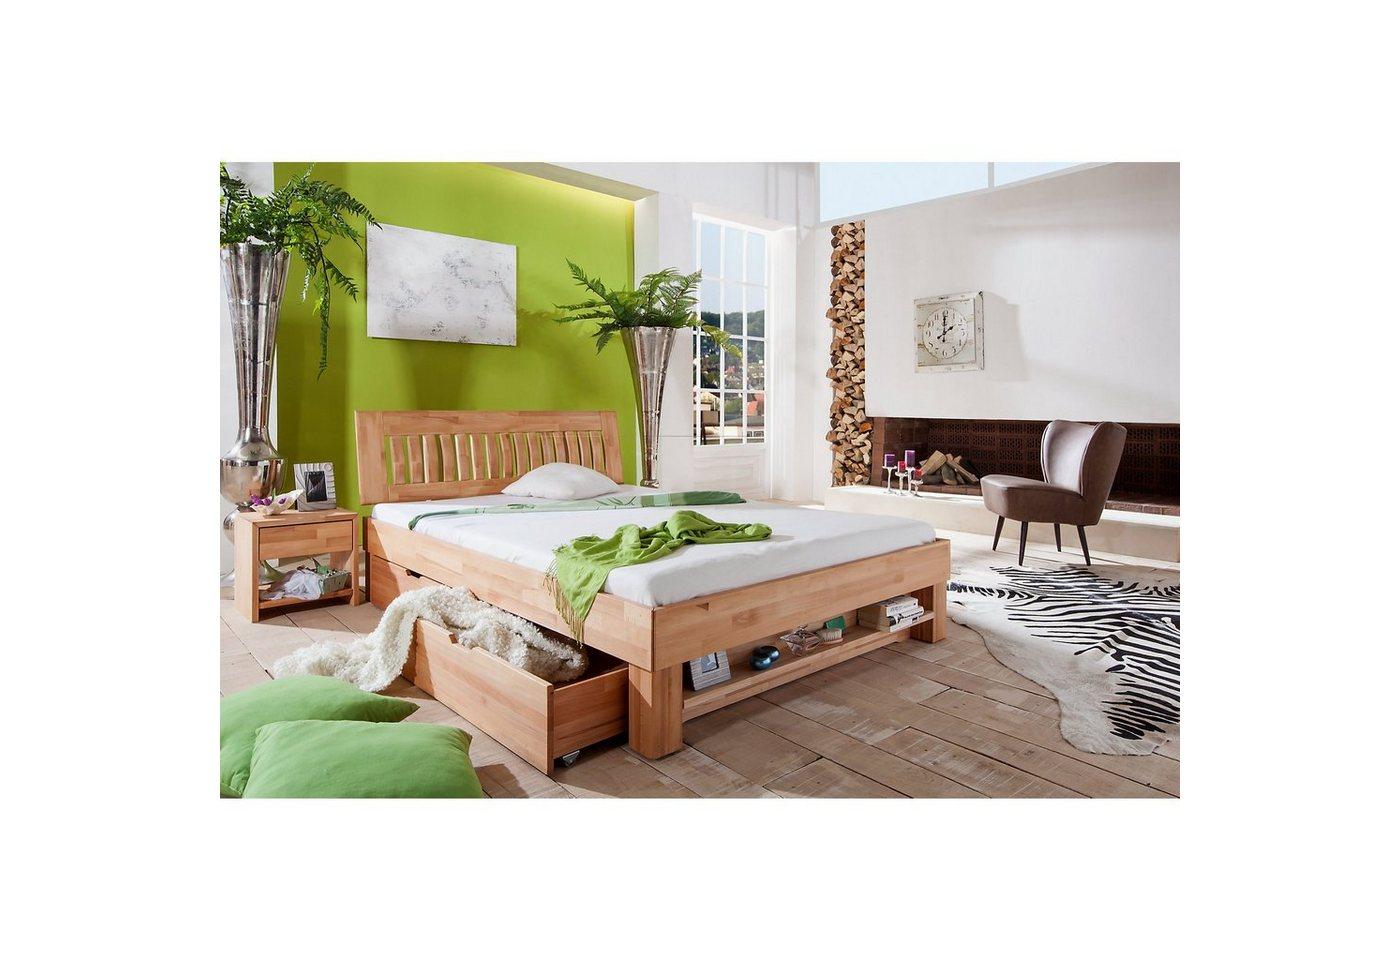 Relita Futonbett KLEOPATRA, Buche massiv, geölt, 180 x 200 cm | Schlafzimmer > Betten > Futonbetten | Braun | Relita